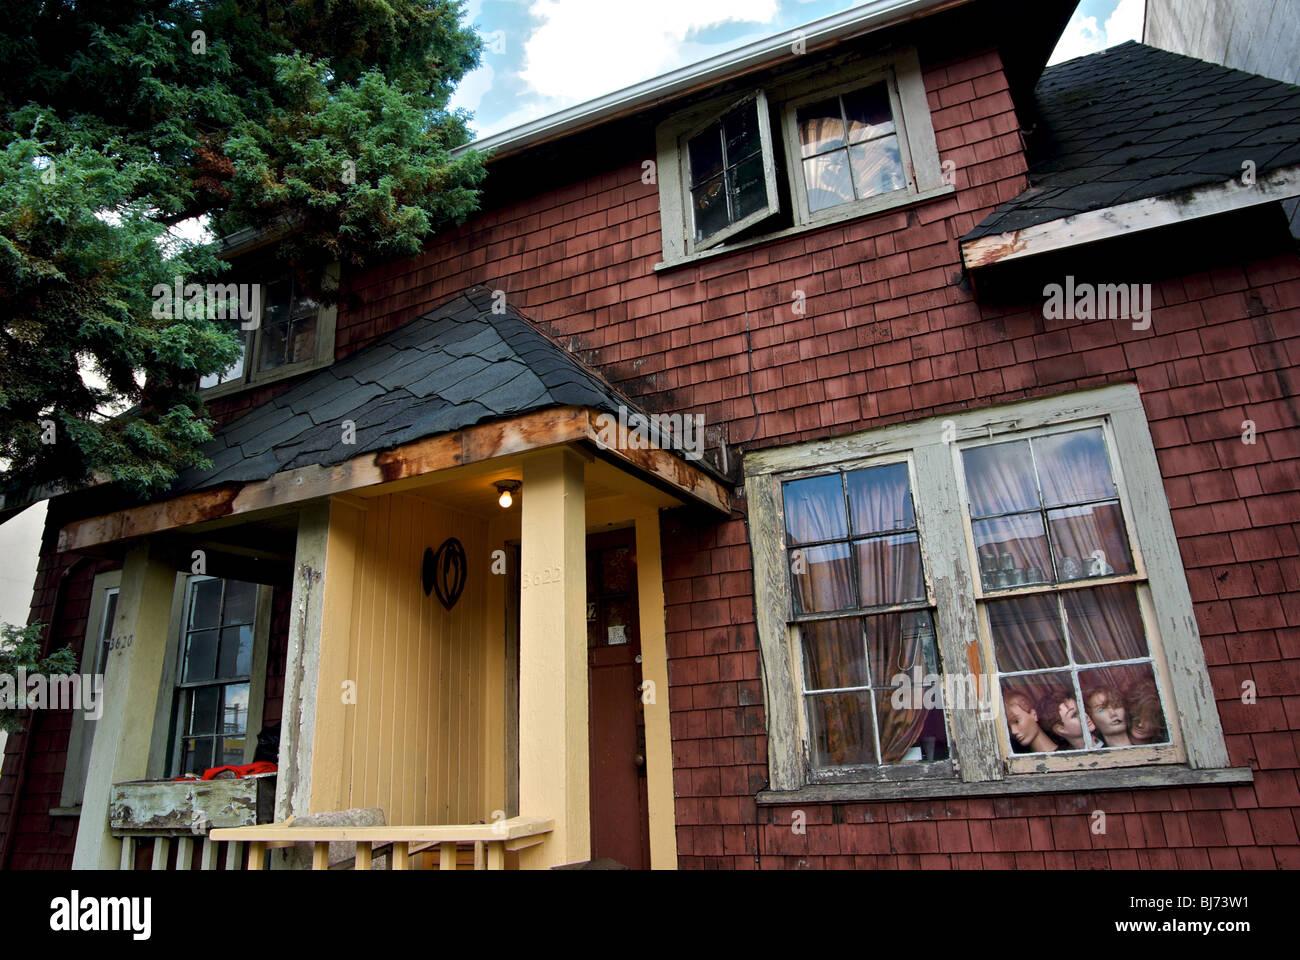 Old Vancouver Mount Pleasant neighborhood rental duplex house in need of repairs - Stock Image